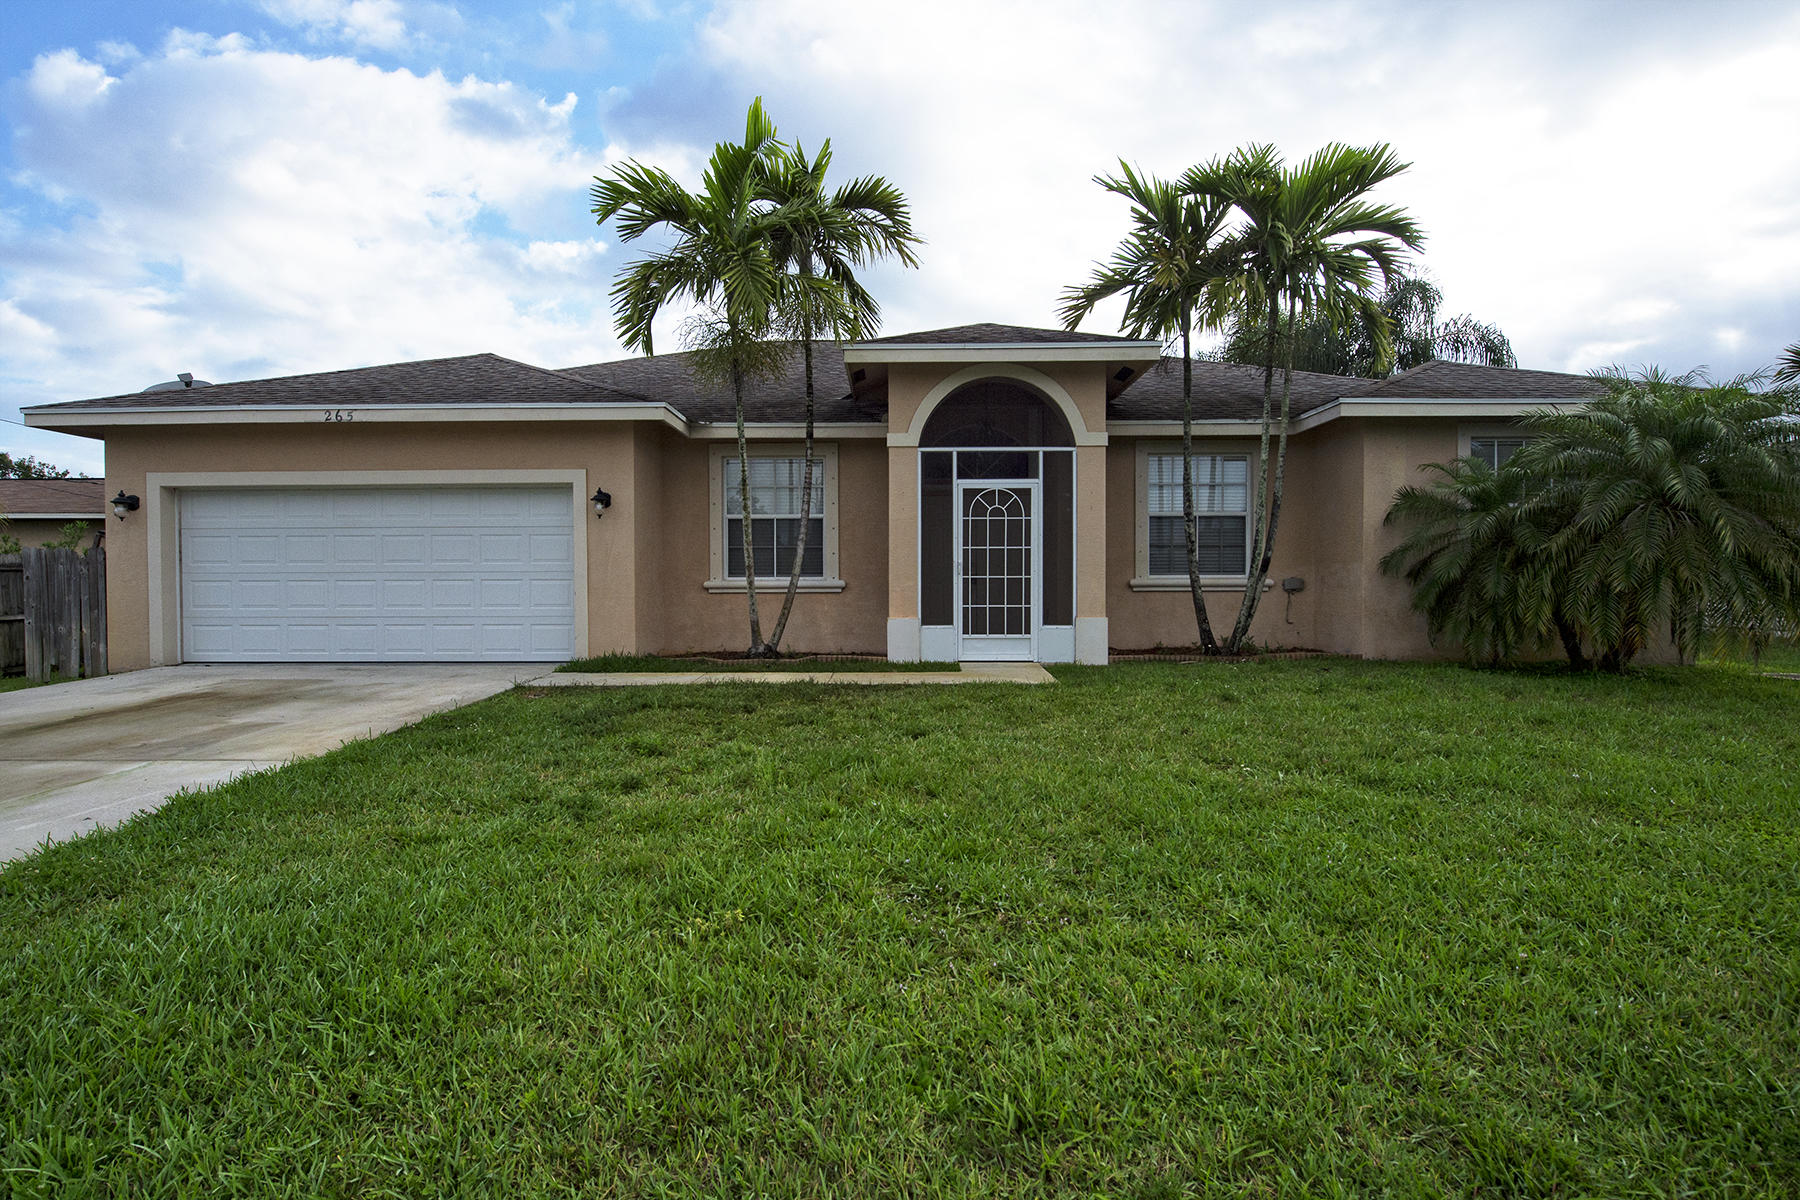 265 SE Whitmore Drive, Port Saint Lucie, Florida